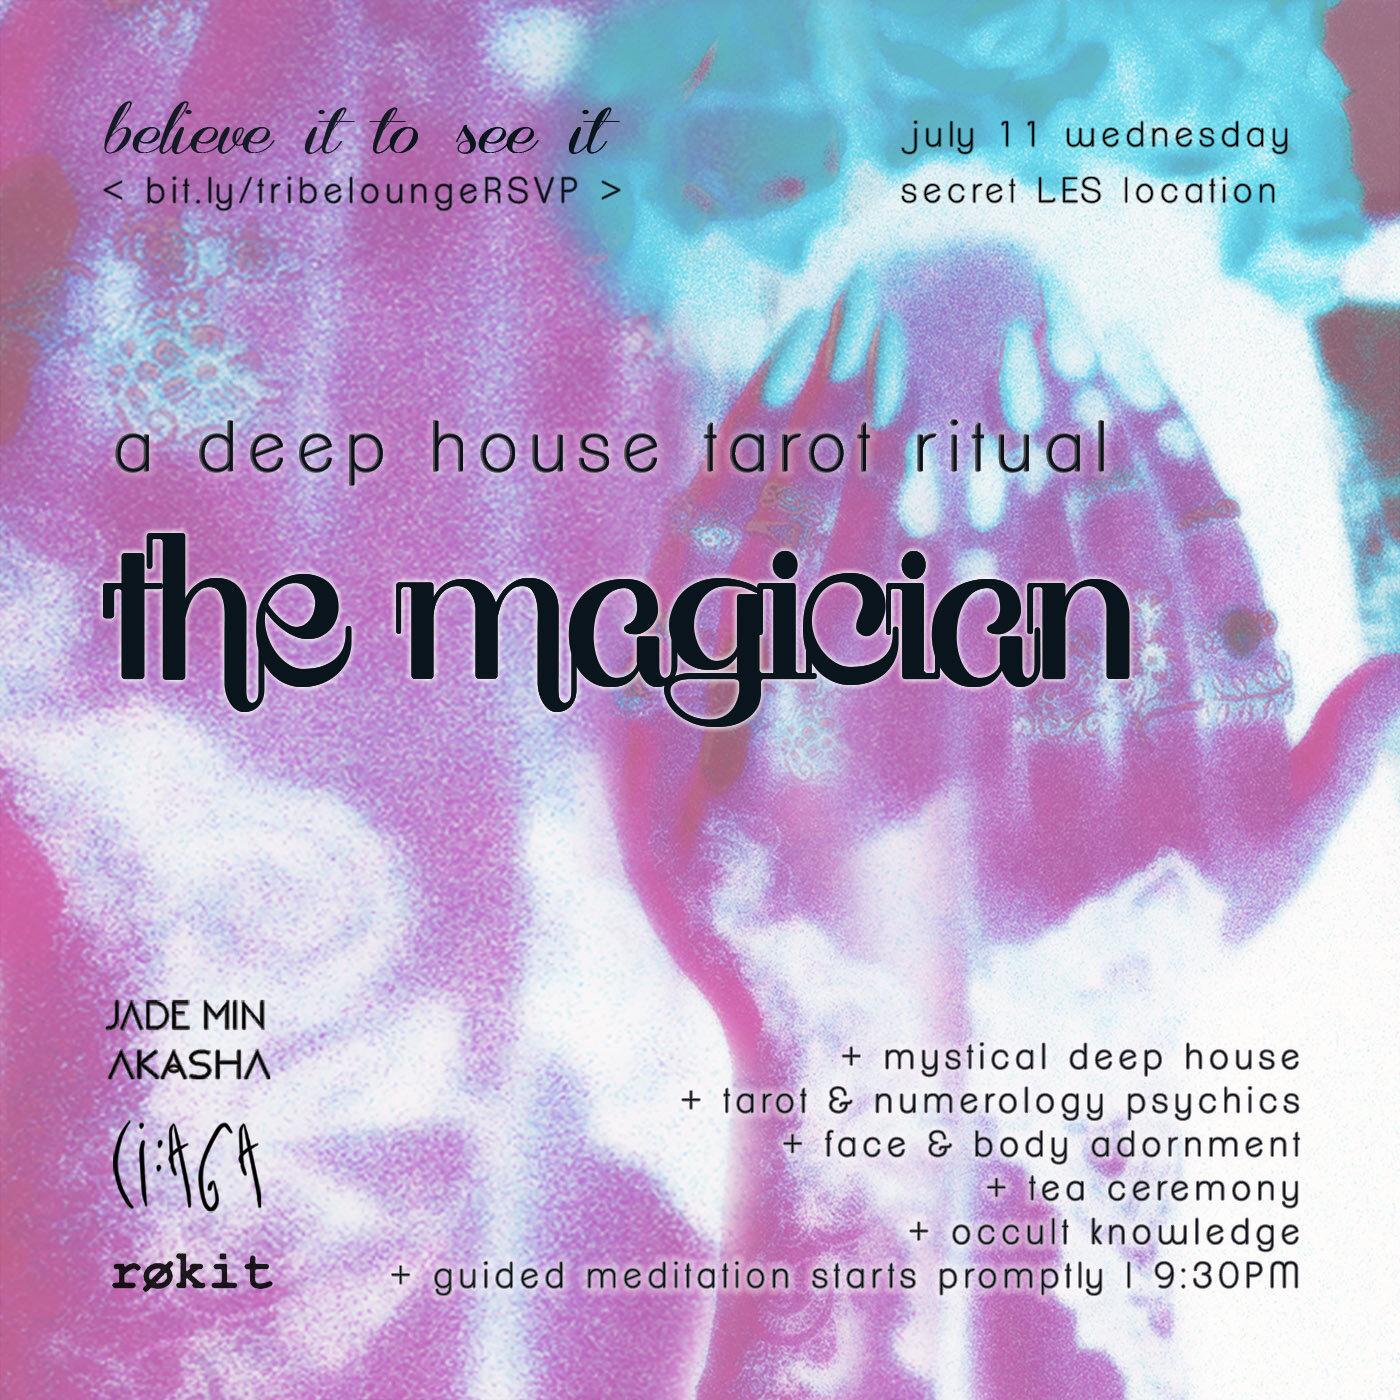 jade min akasha - the magician.jpg